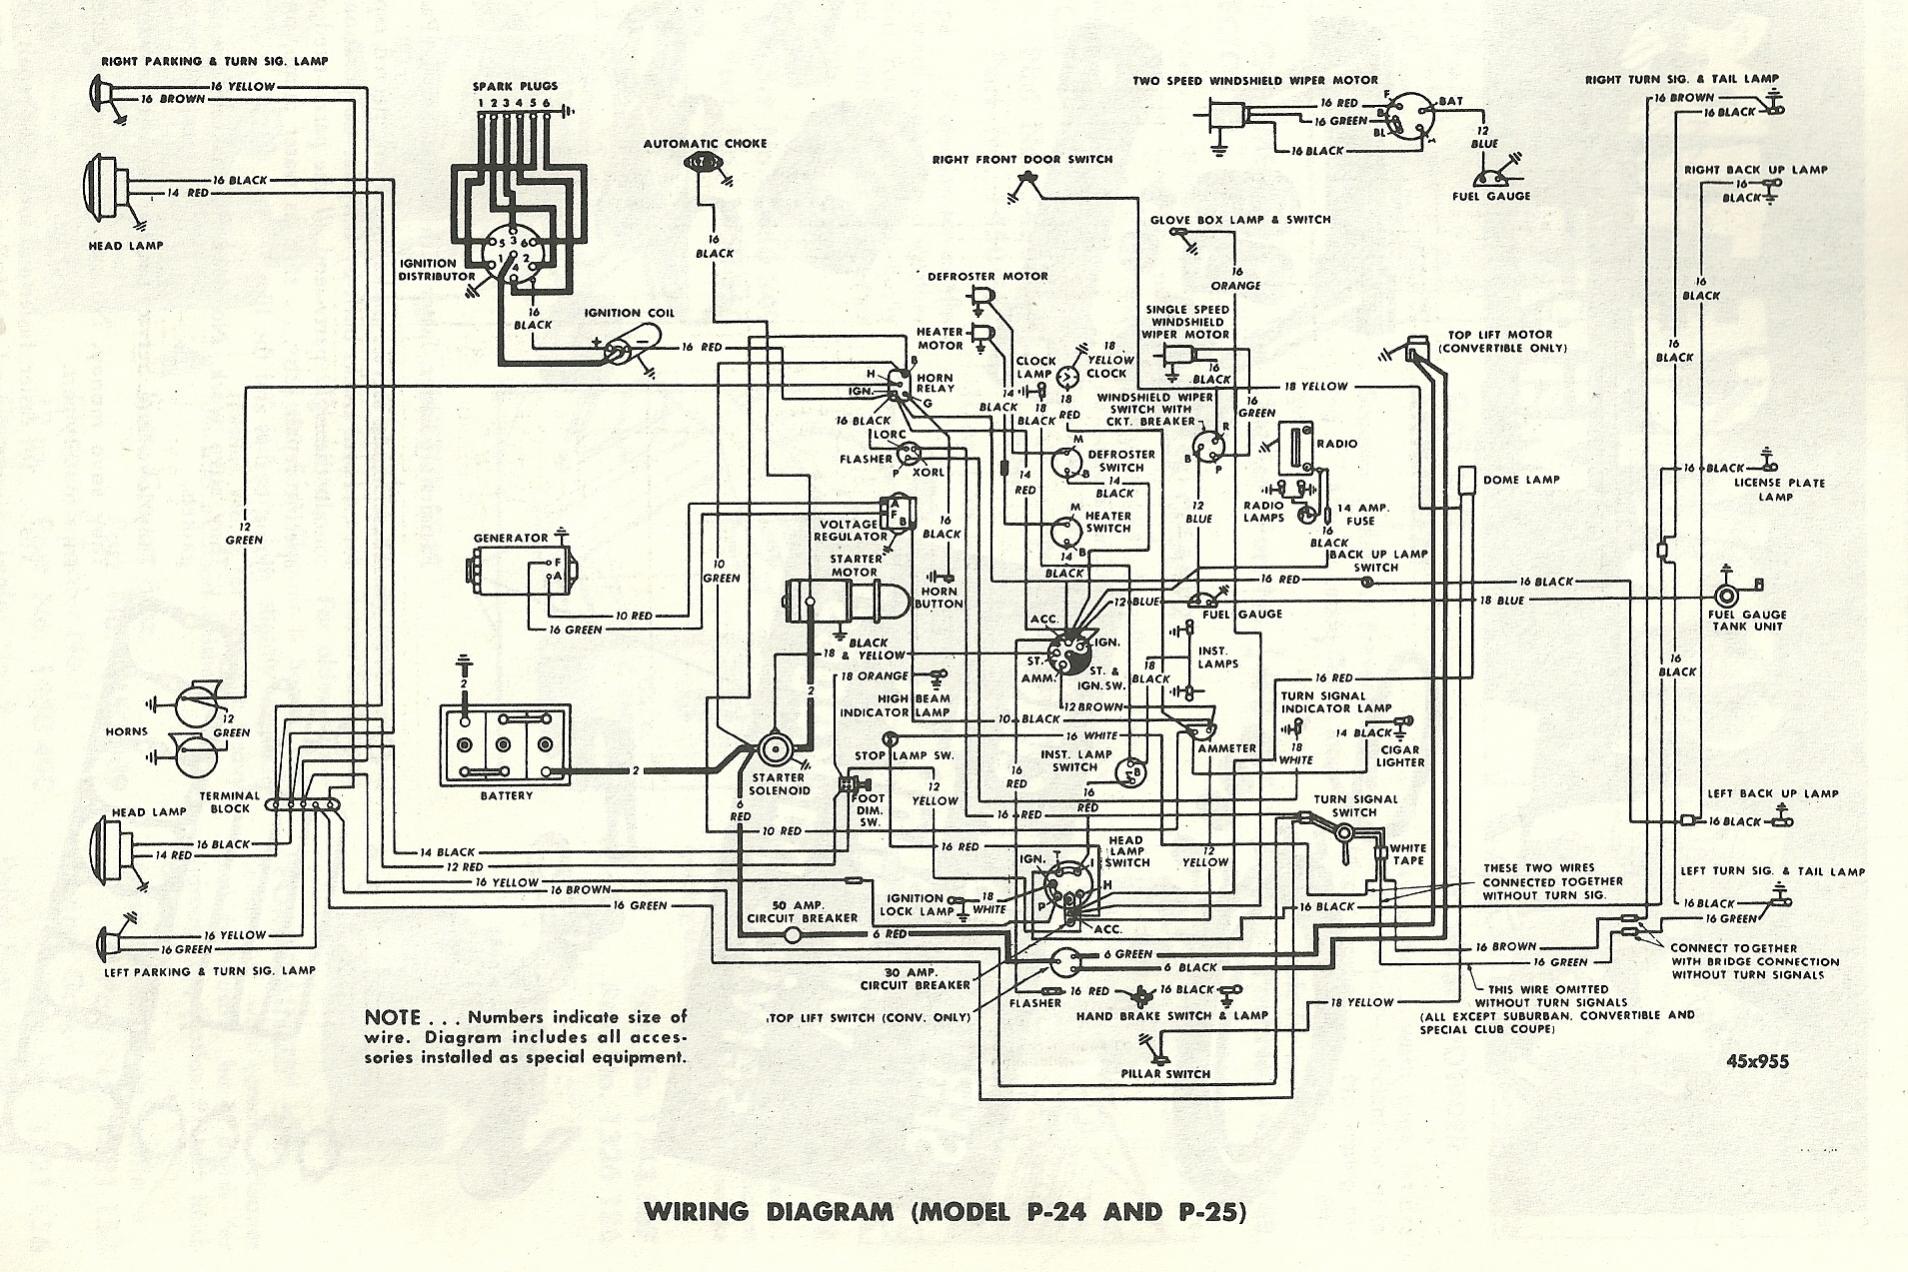 1951 farmall m wiring diagram trane voyager 3 for a super c